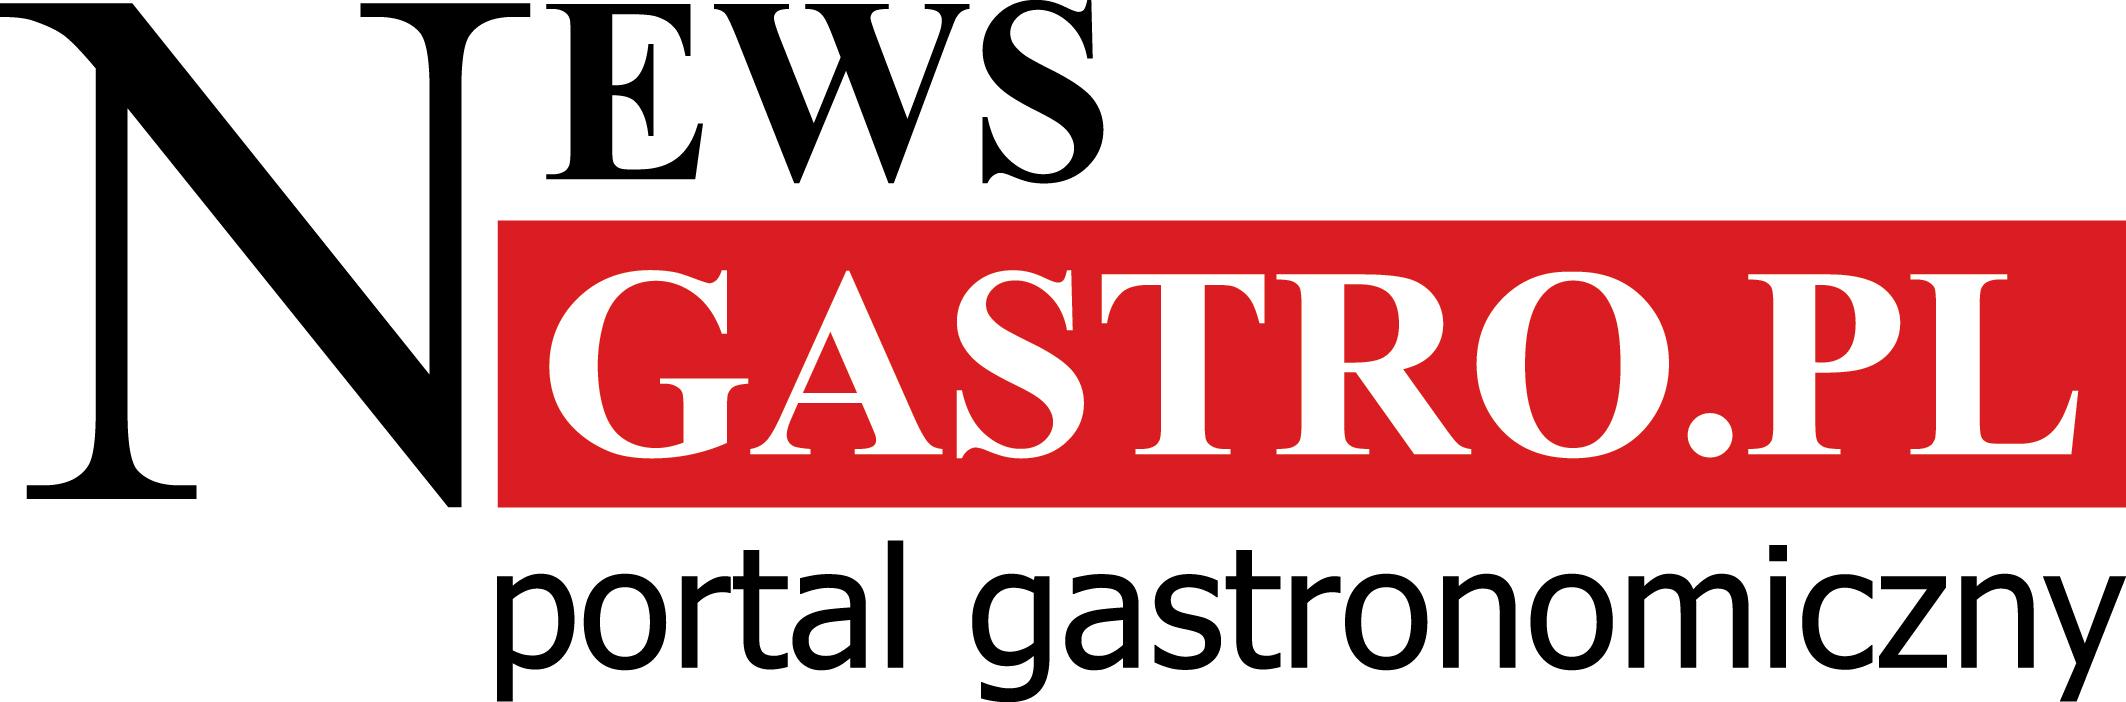 NEWS_GASTRO_LOGO